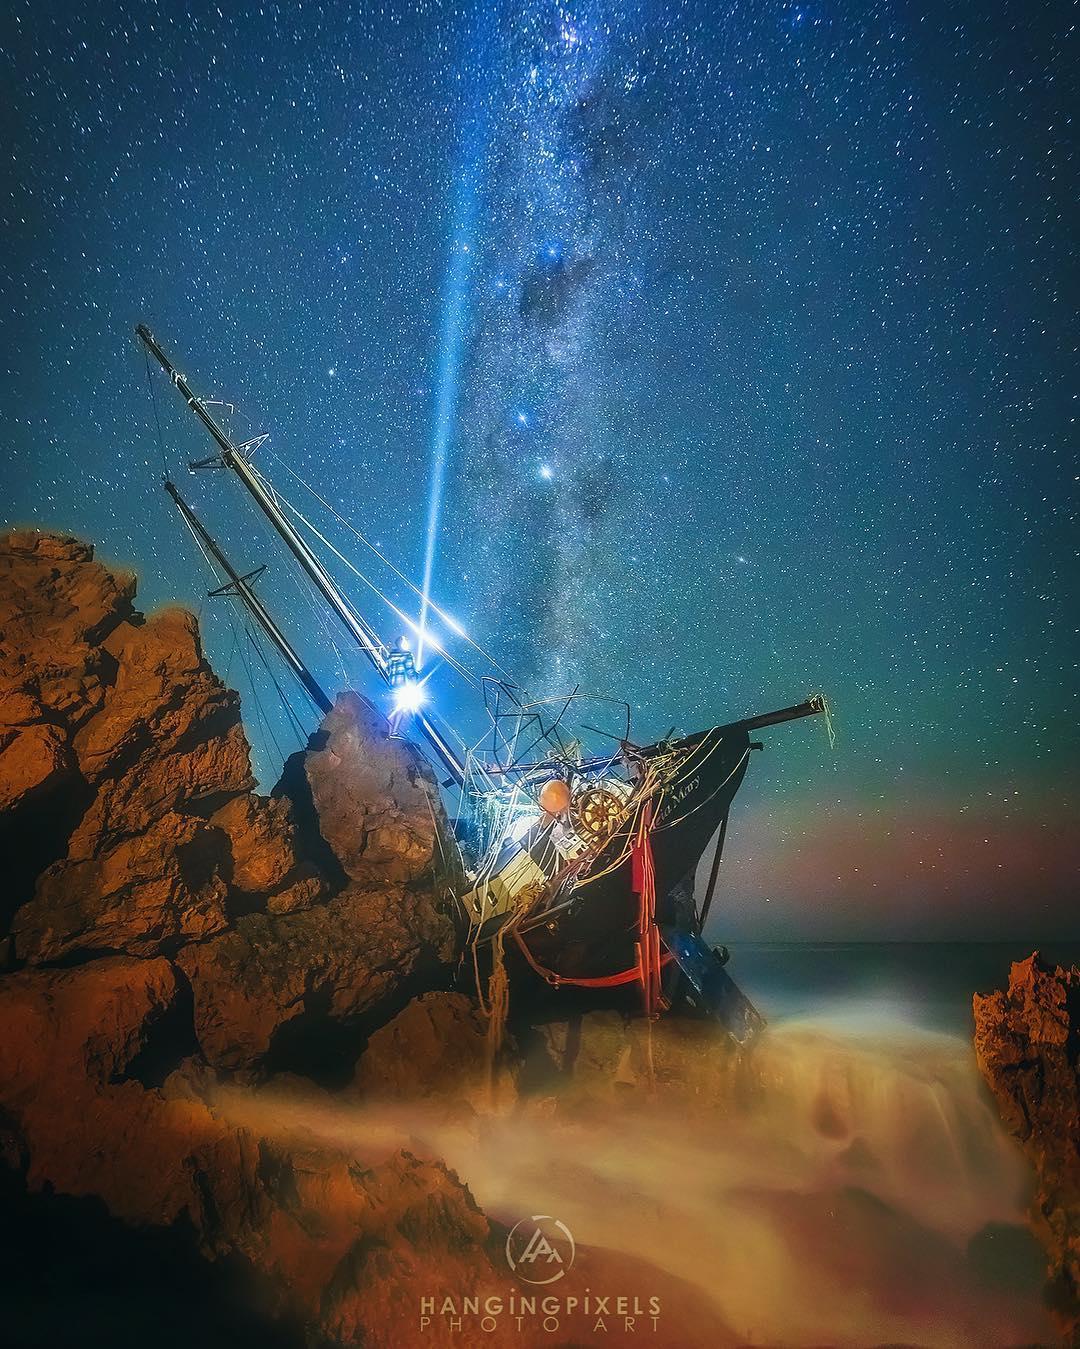 abandoned ship washed up on rocks of ocean